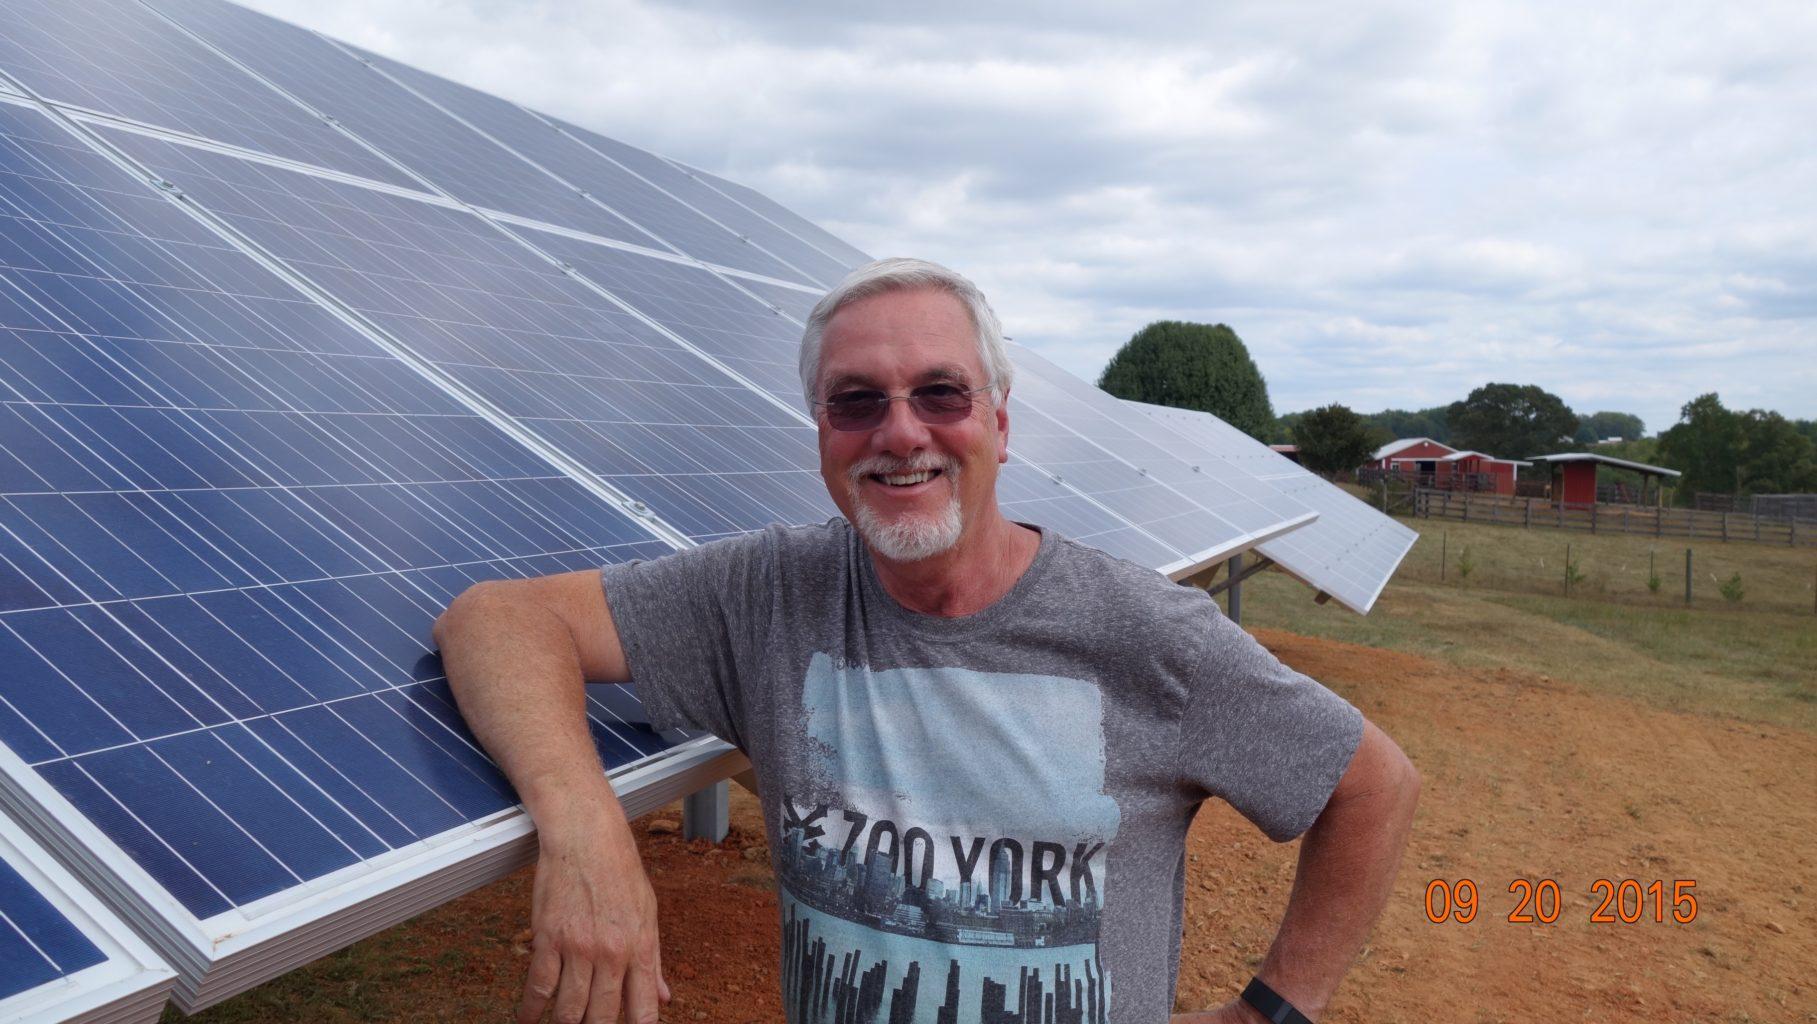 Steve Thomas with his solar panels